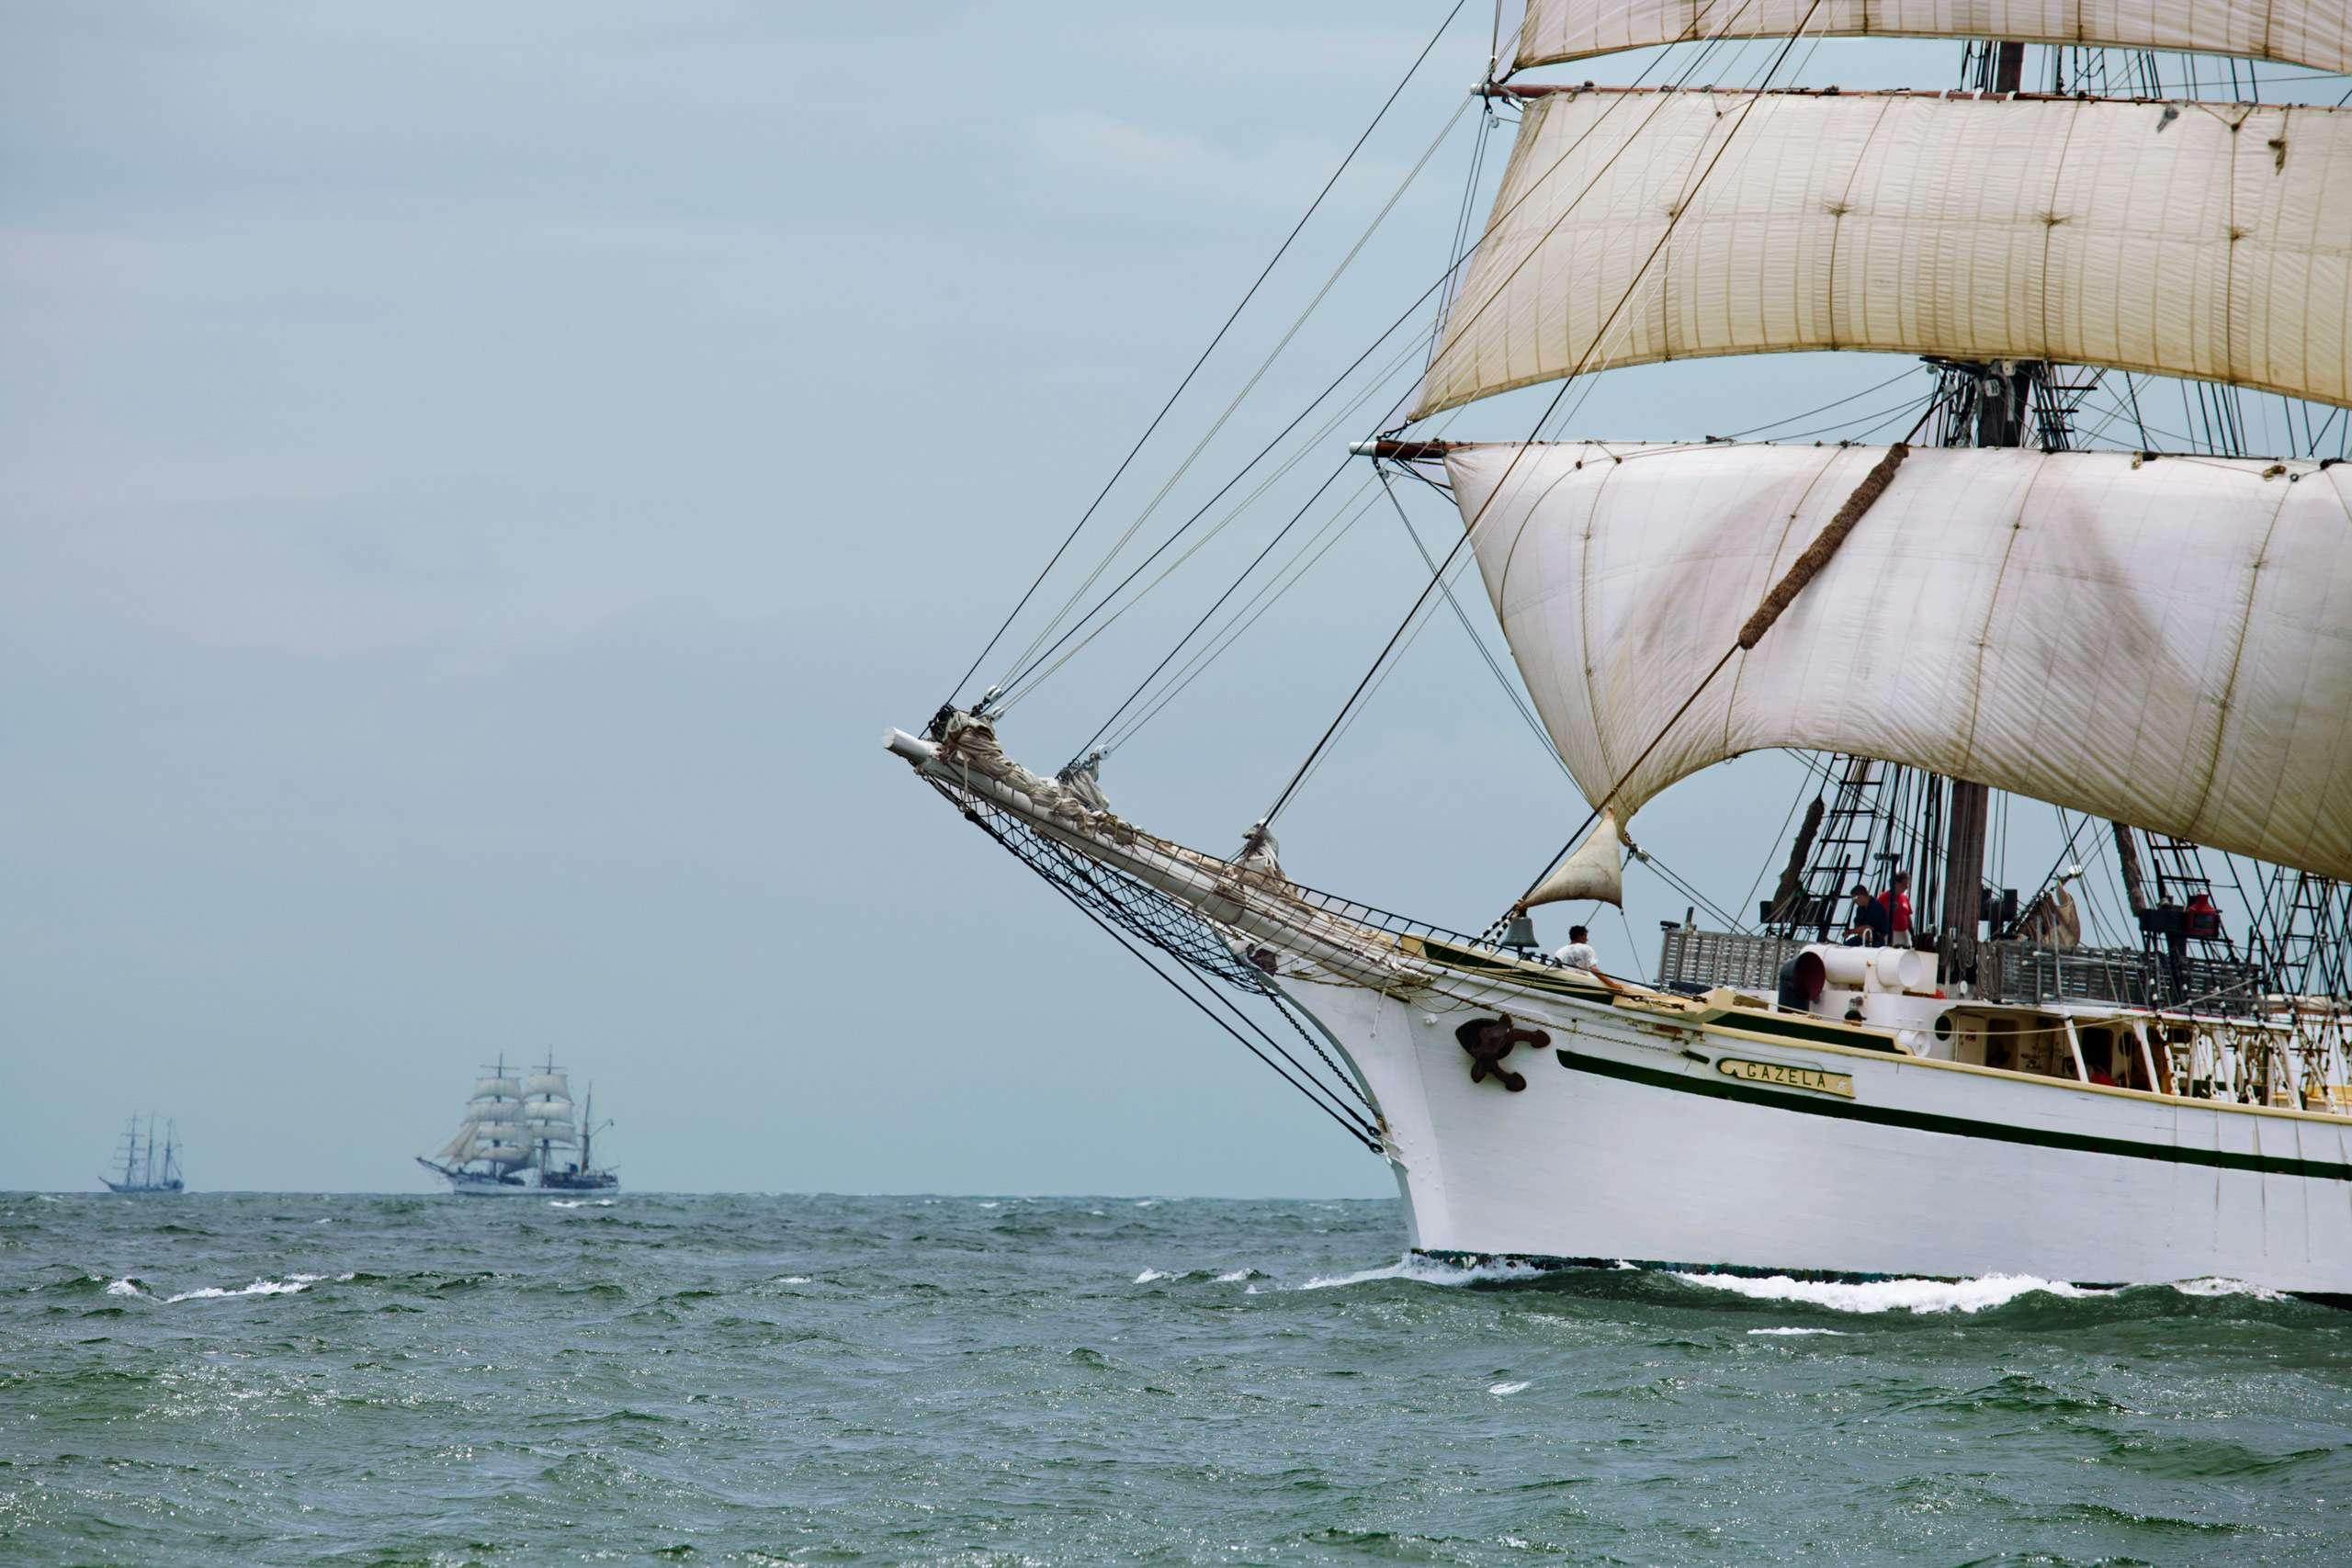 PORTFOLIO - Sailing - Windjammers #4    PCG764